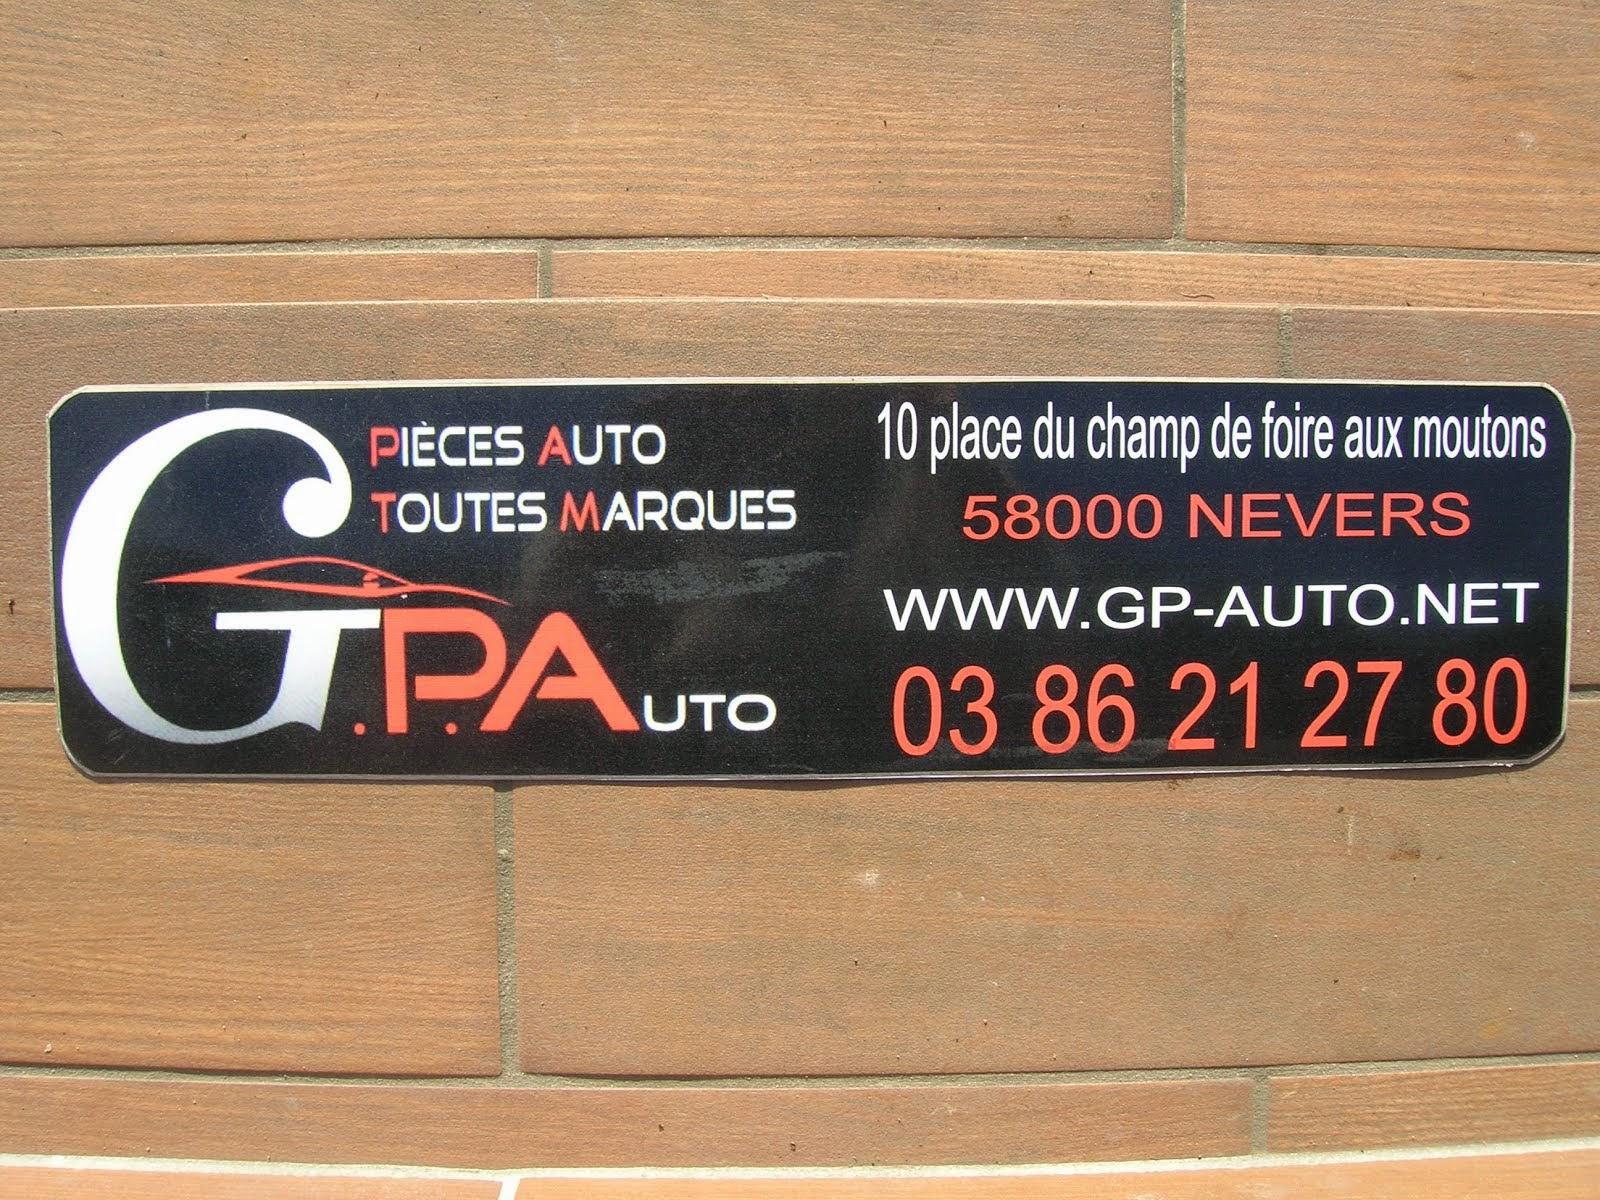 GPA Auto